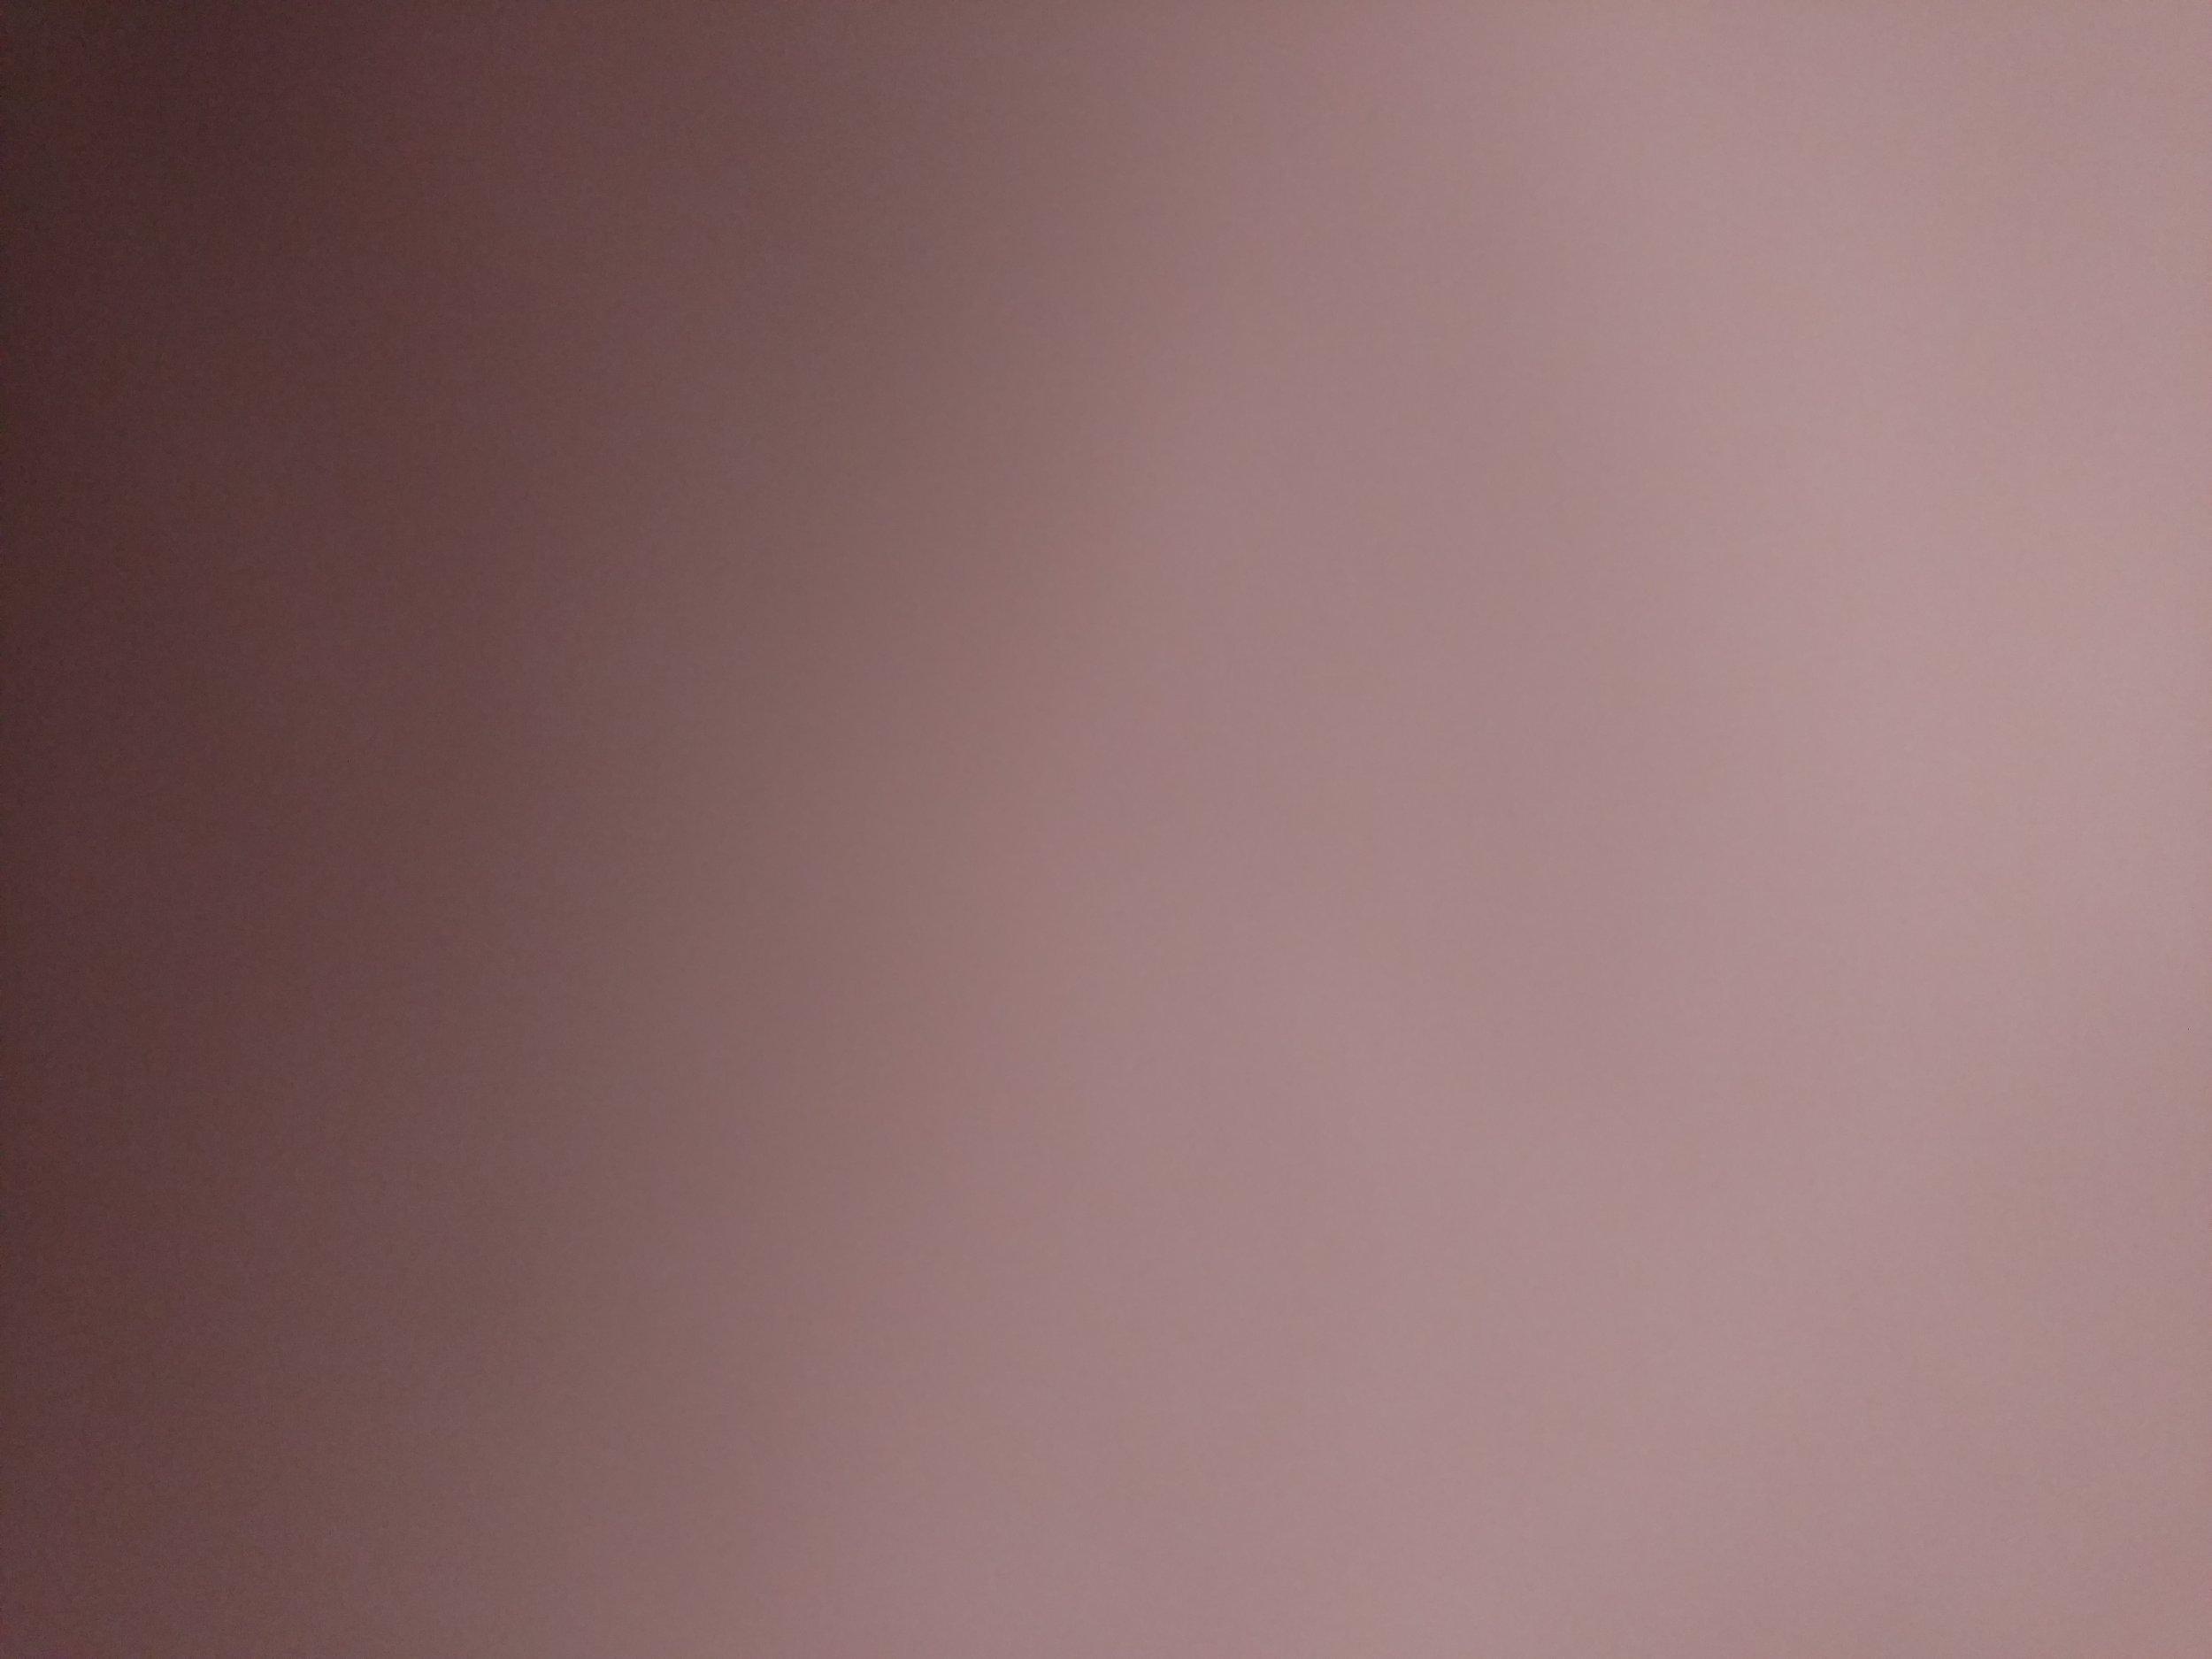 willroth-co-free-texture-gradient-017.jpg